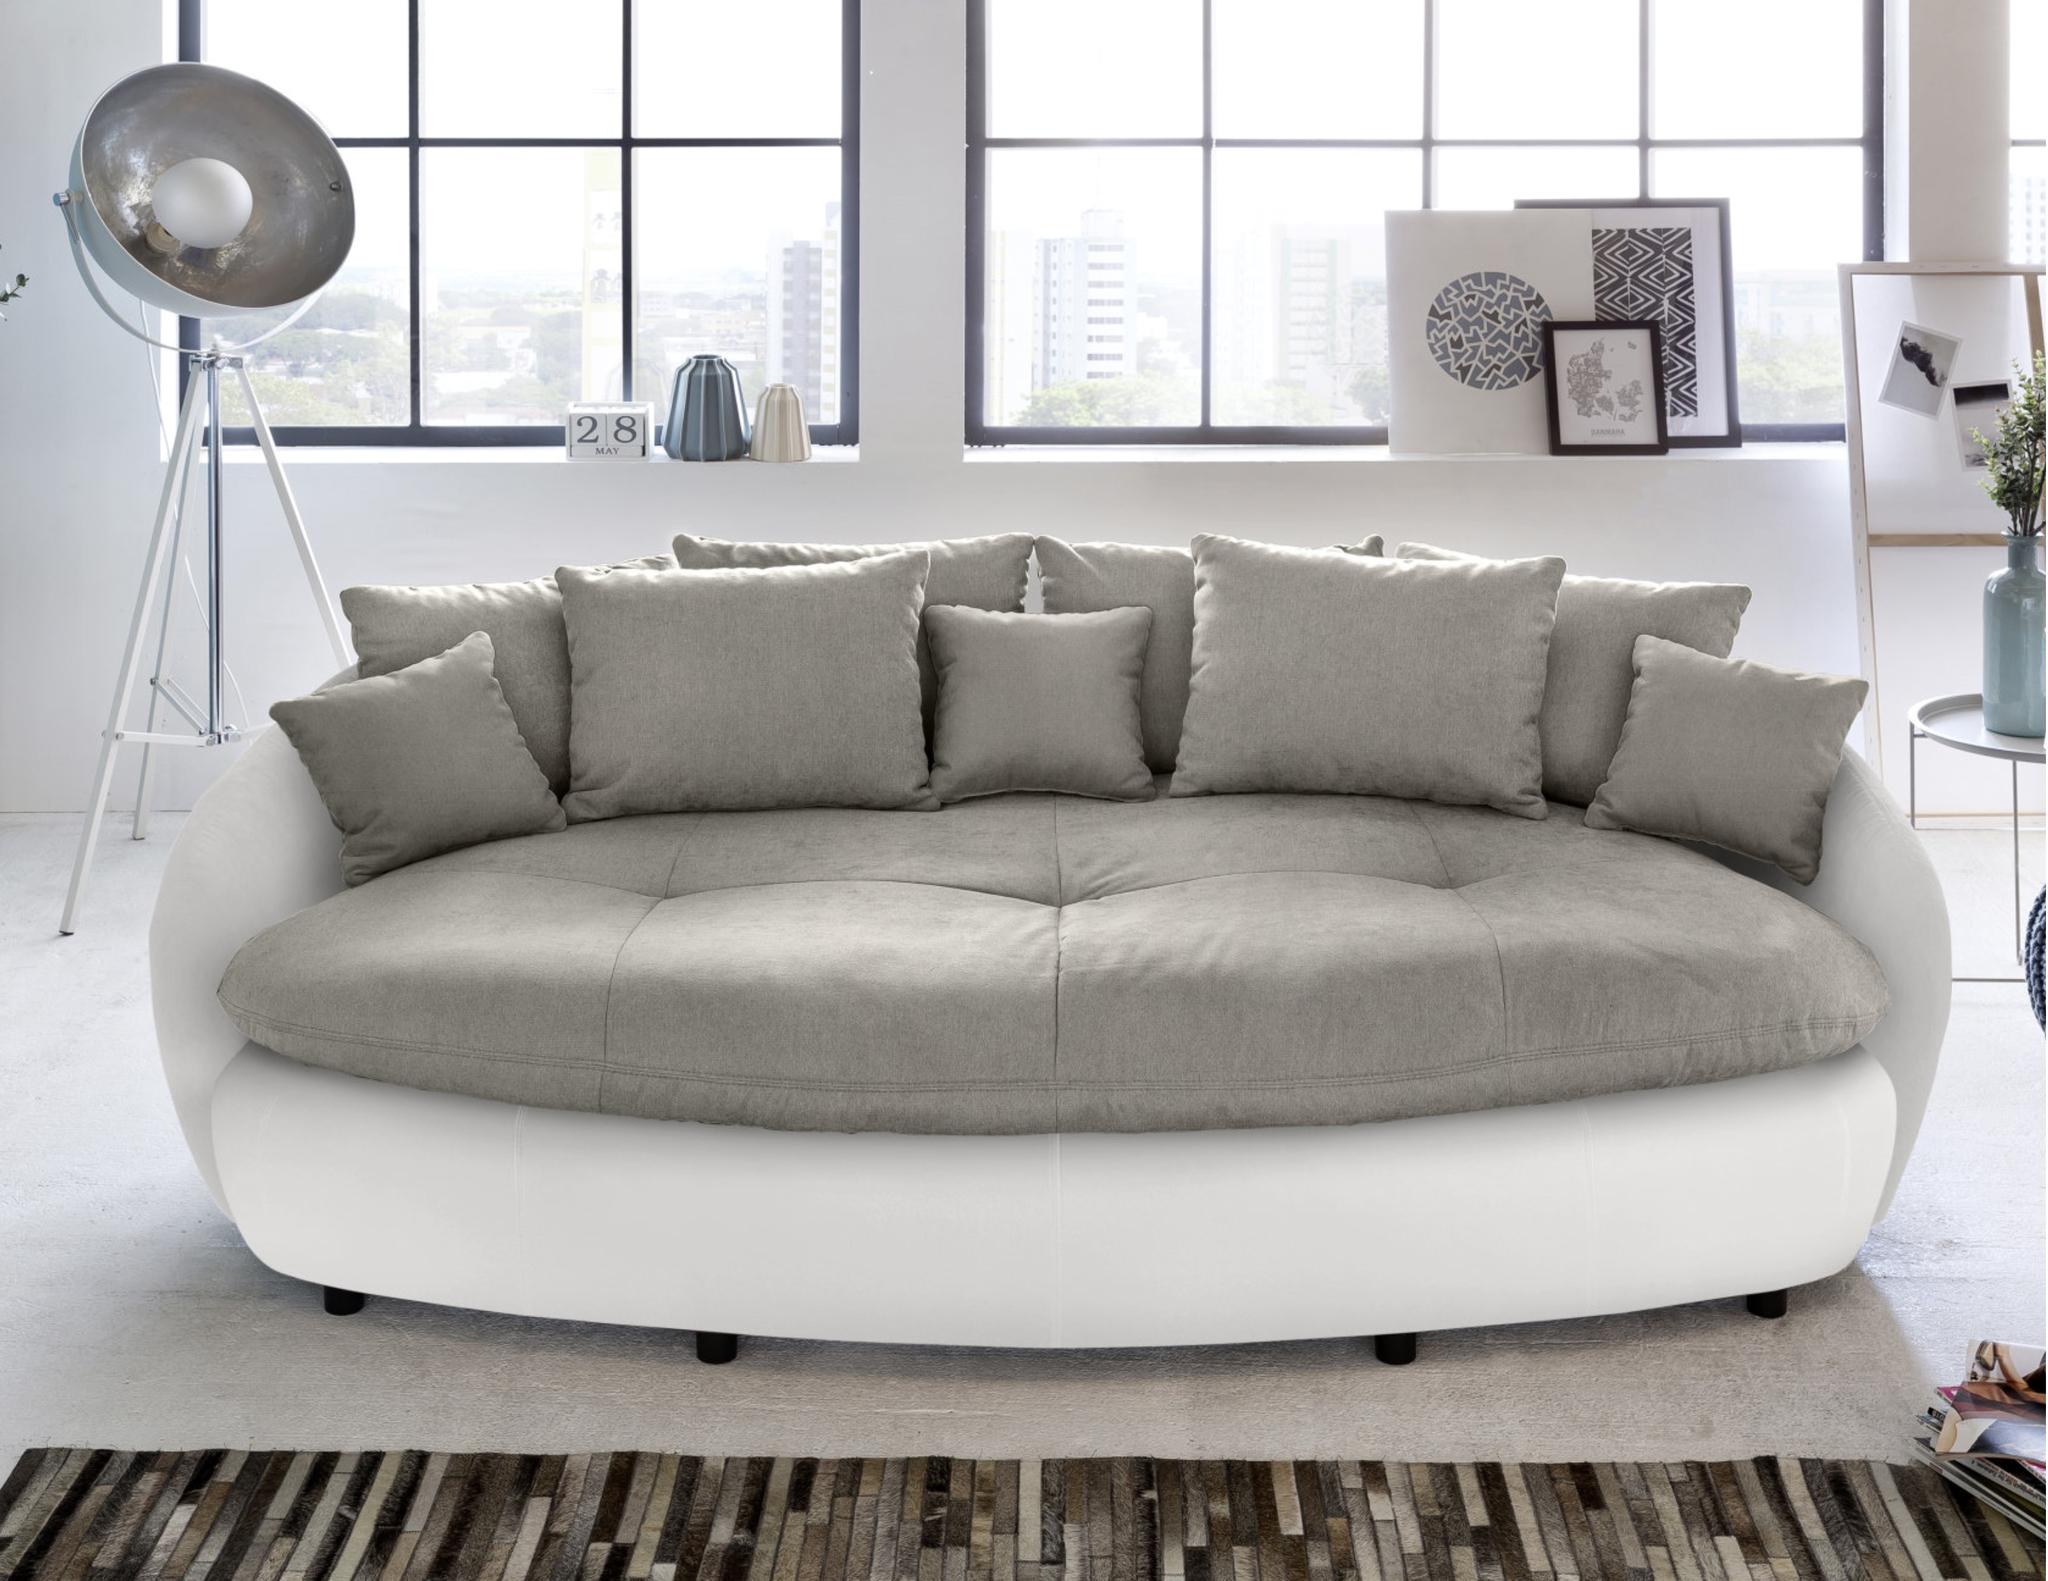 Full Size of Mega Sofa Furniture Trading Rose Divano Megasofa Conforama Mass Productions Mercatone Uno Mycouch Aruba Online Gnstig Kaufen Disco Mbel Ottomane Zweisitzer Sofa Mega Sofa